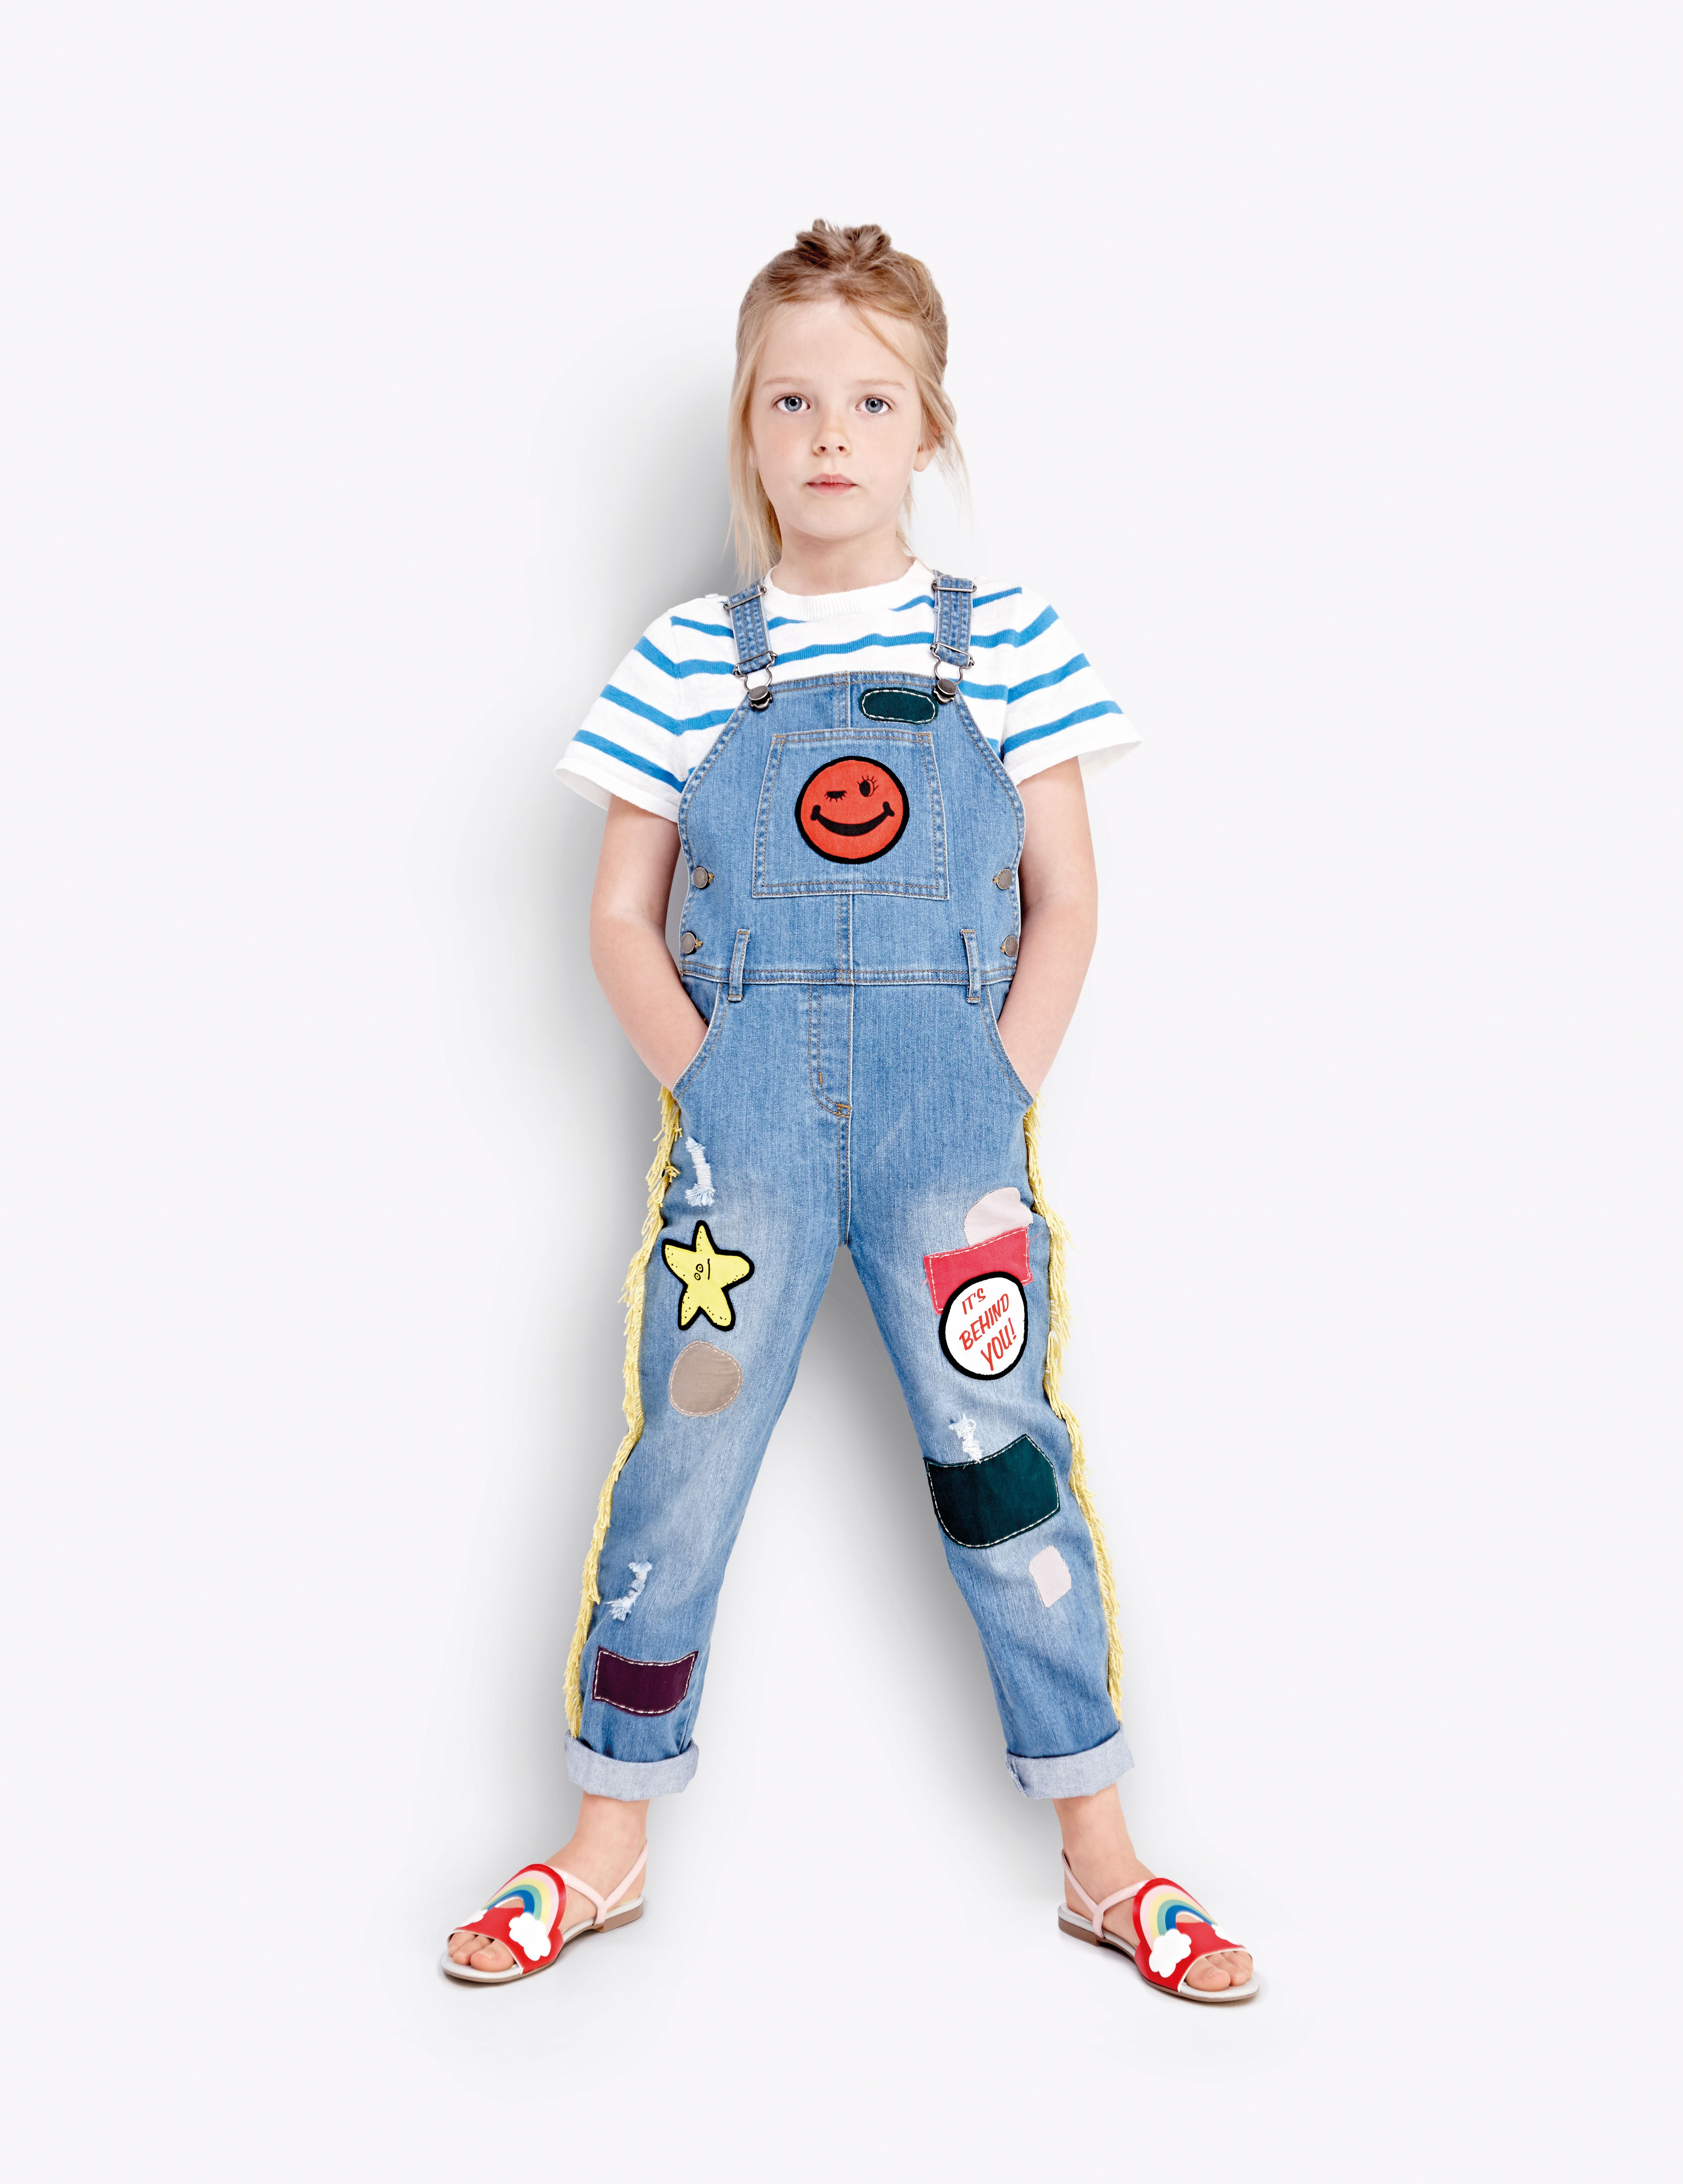 dbec10a1a6c8 The Stella McCartney Kids SS15 Collection.  StellaKids